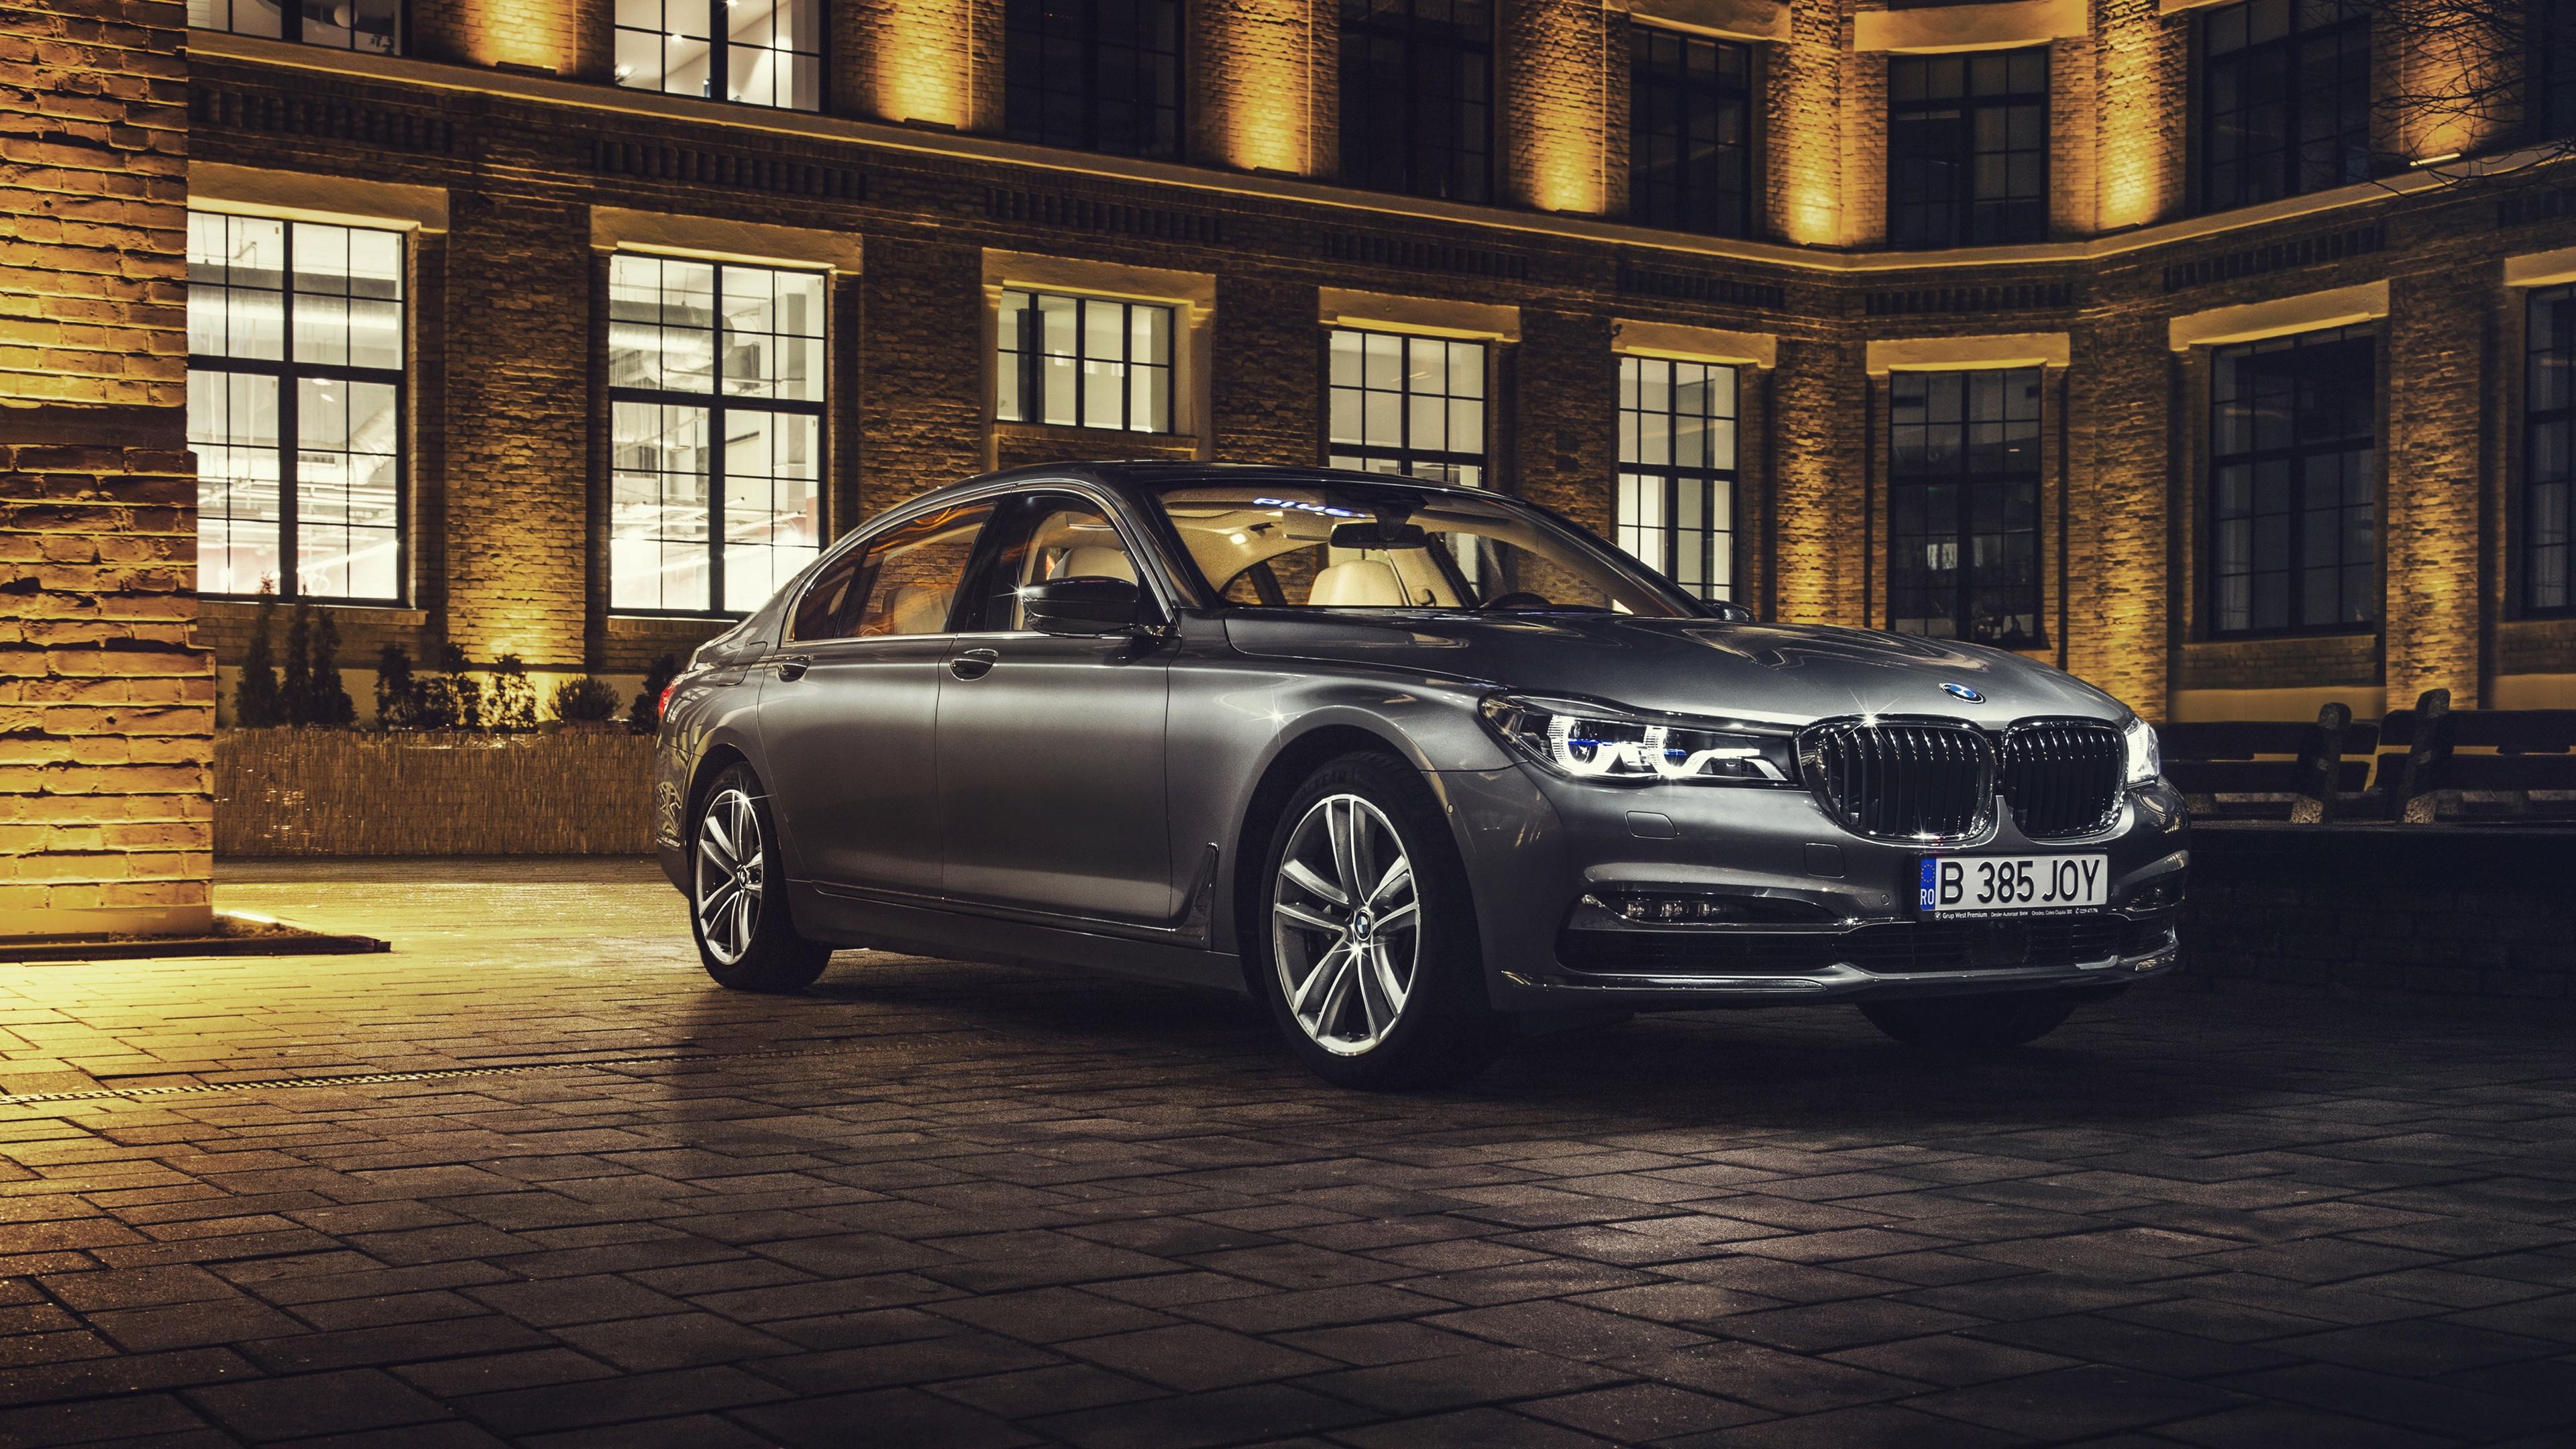 2017 BMW 7 Series Wallpaper | HD Car Wallpapers | ID #6736